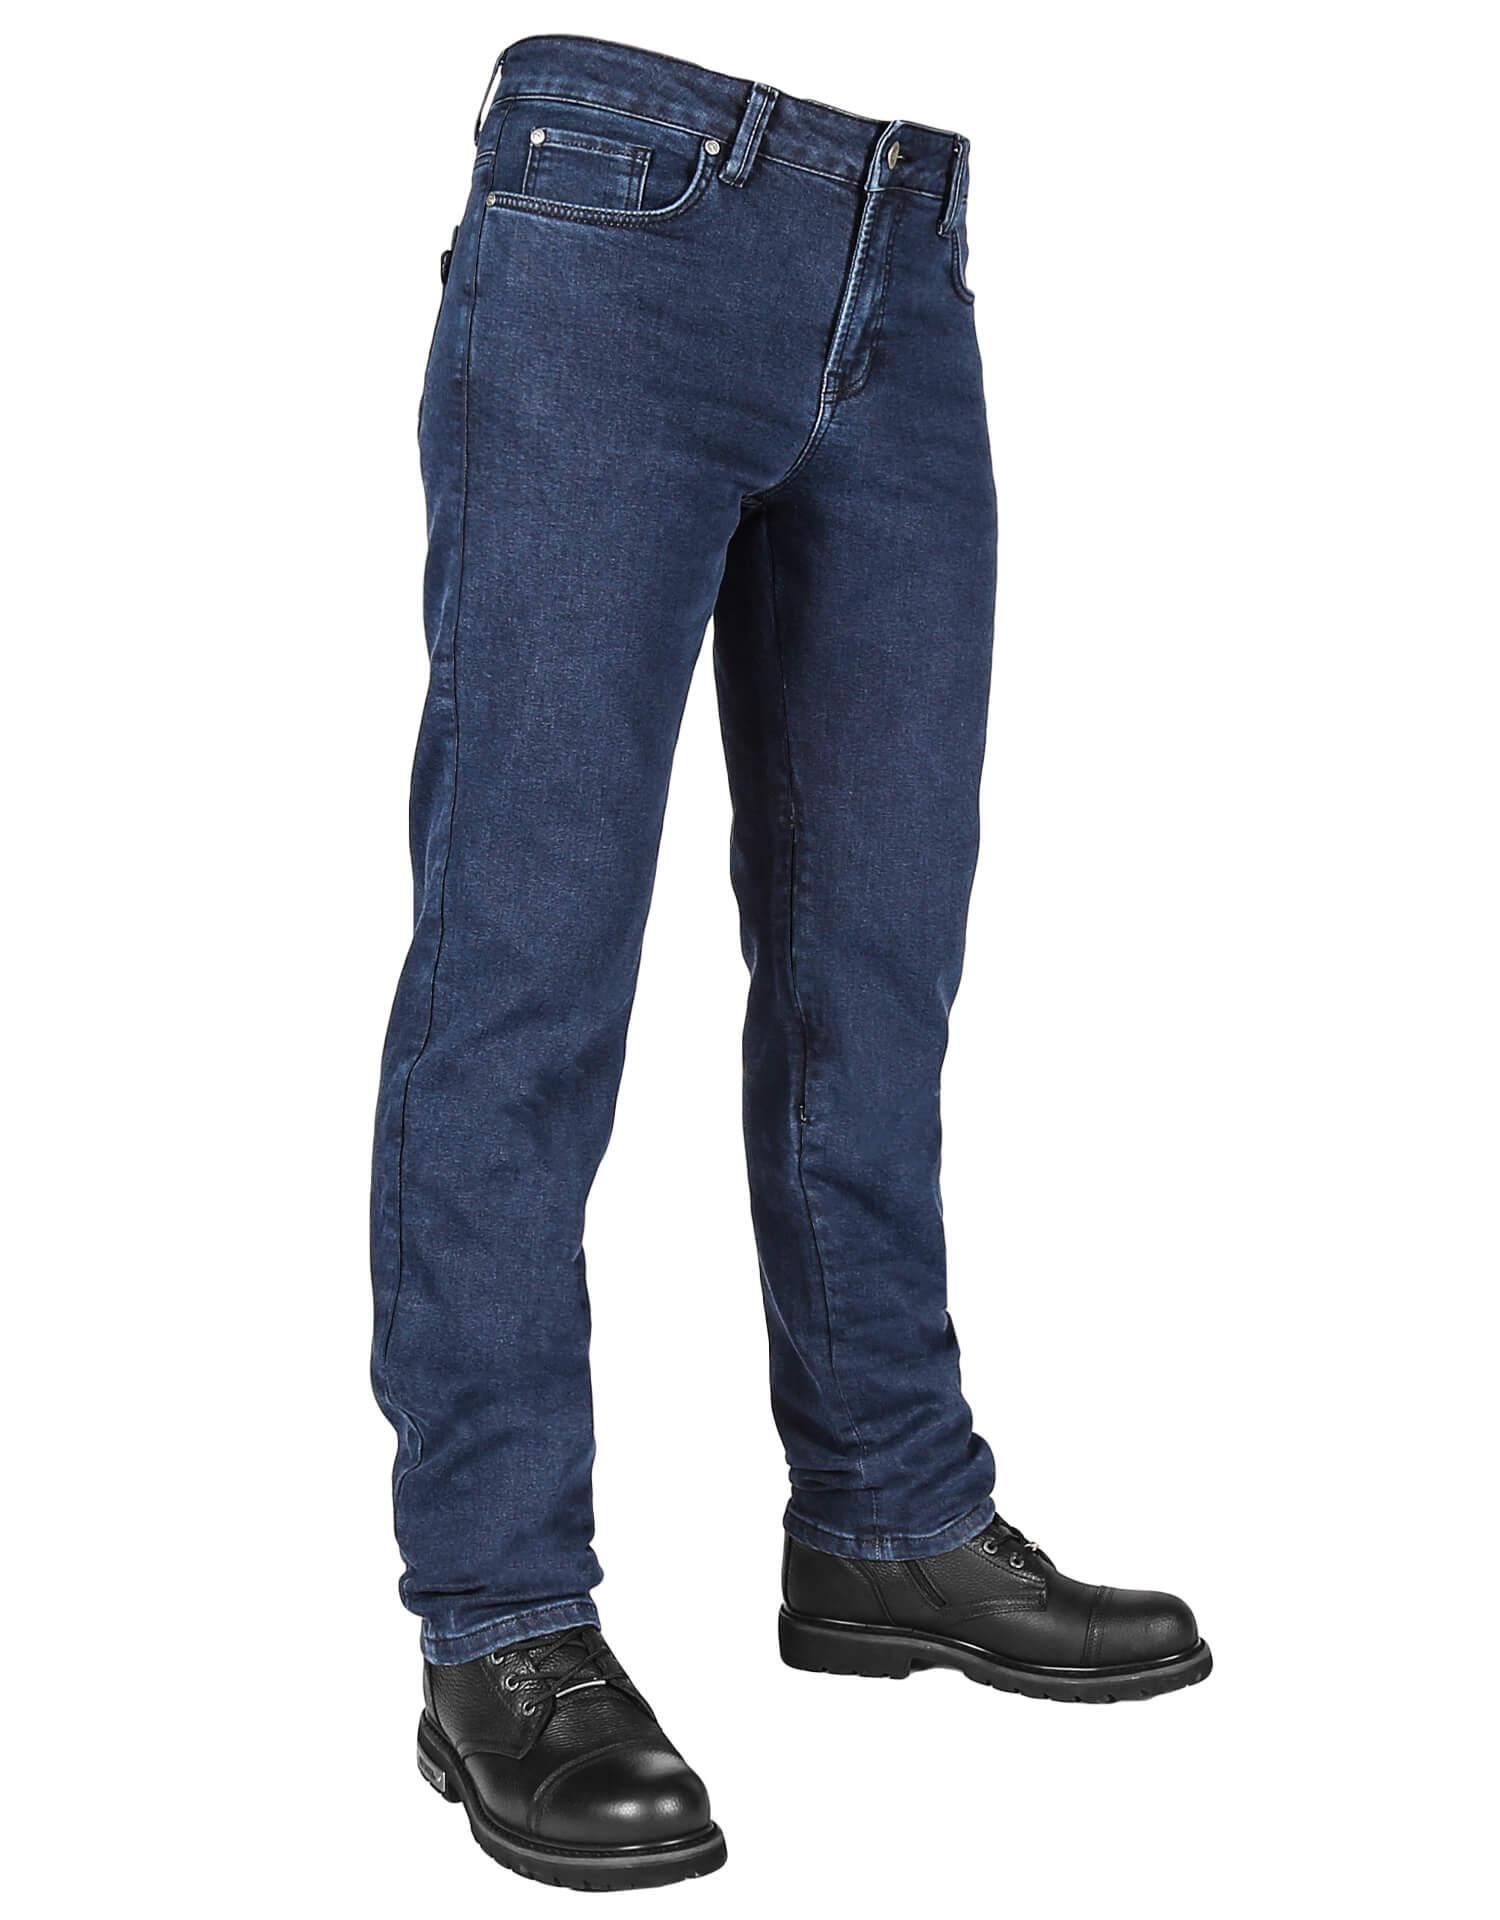 The Biker Jeans - Urbanizer Dark Blue Cordura® Korumalı Motosiklet Kot Pantolonu